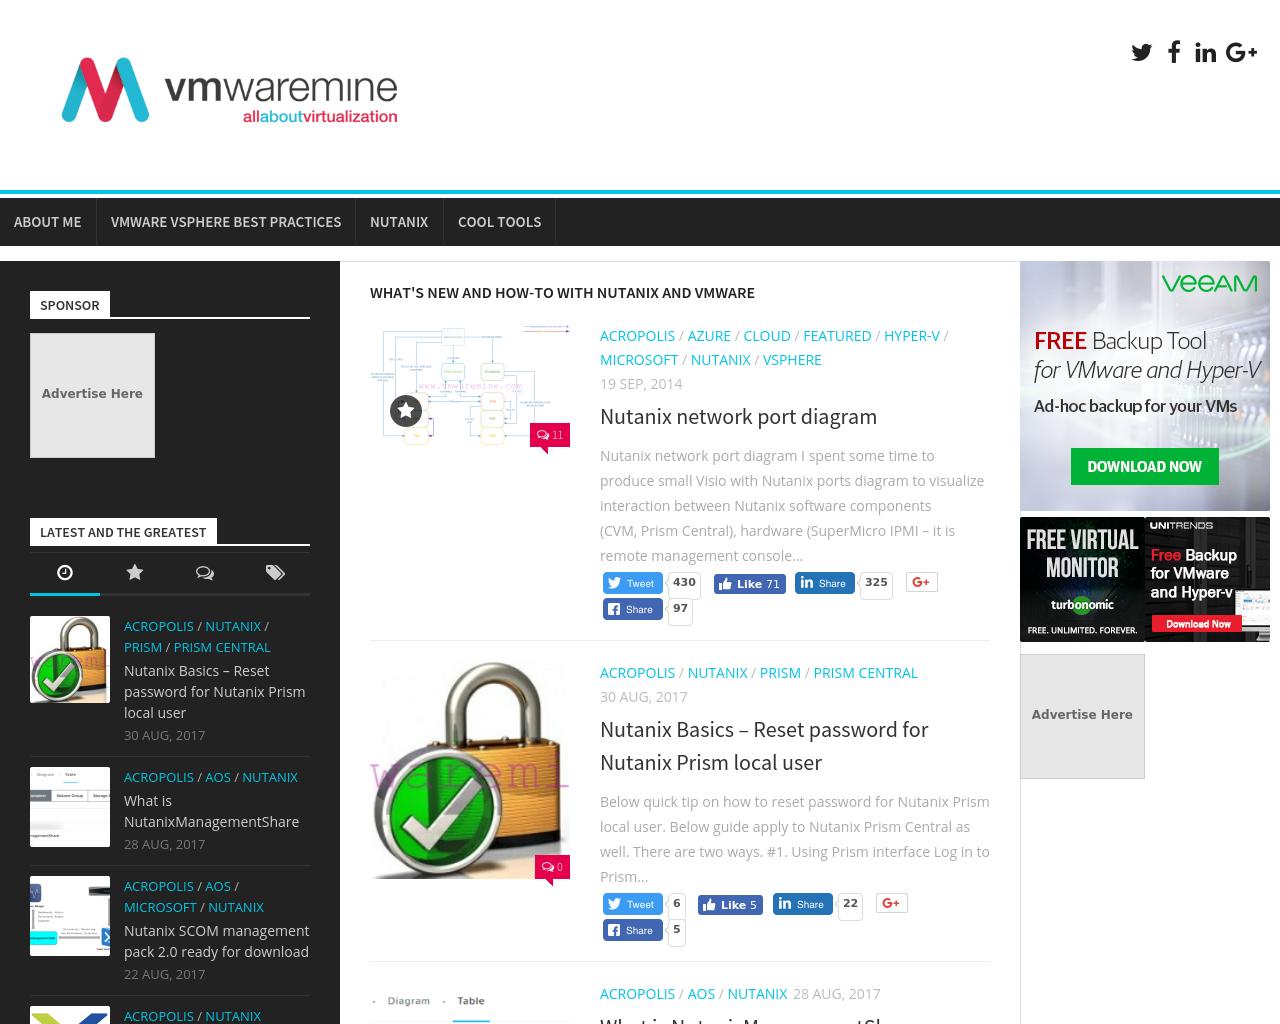 Vmwaremine-Advertising-Reviews-Pricing